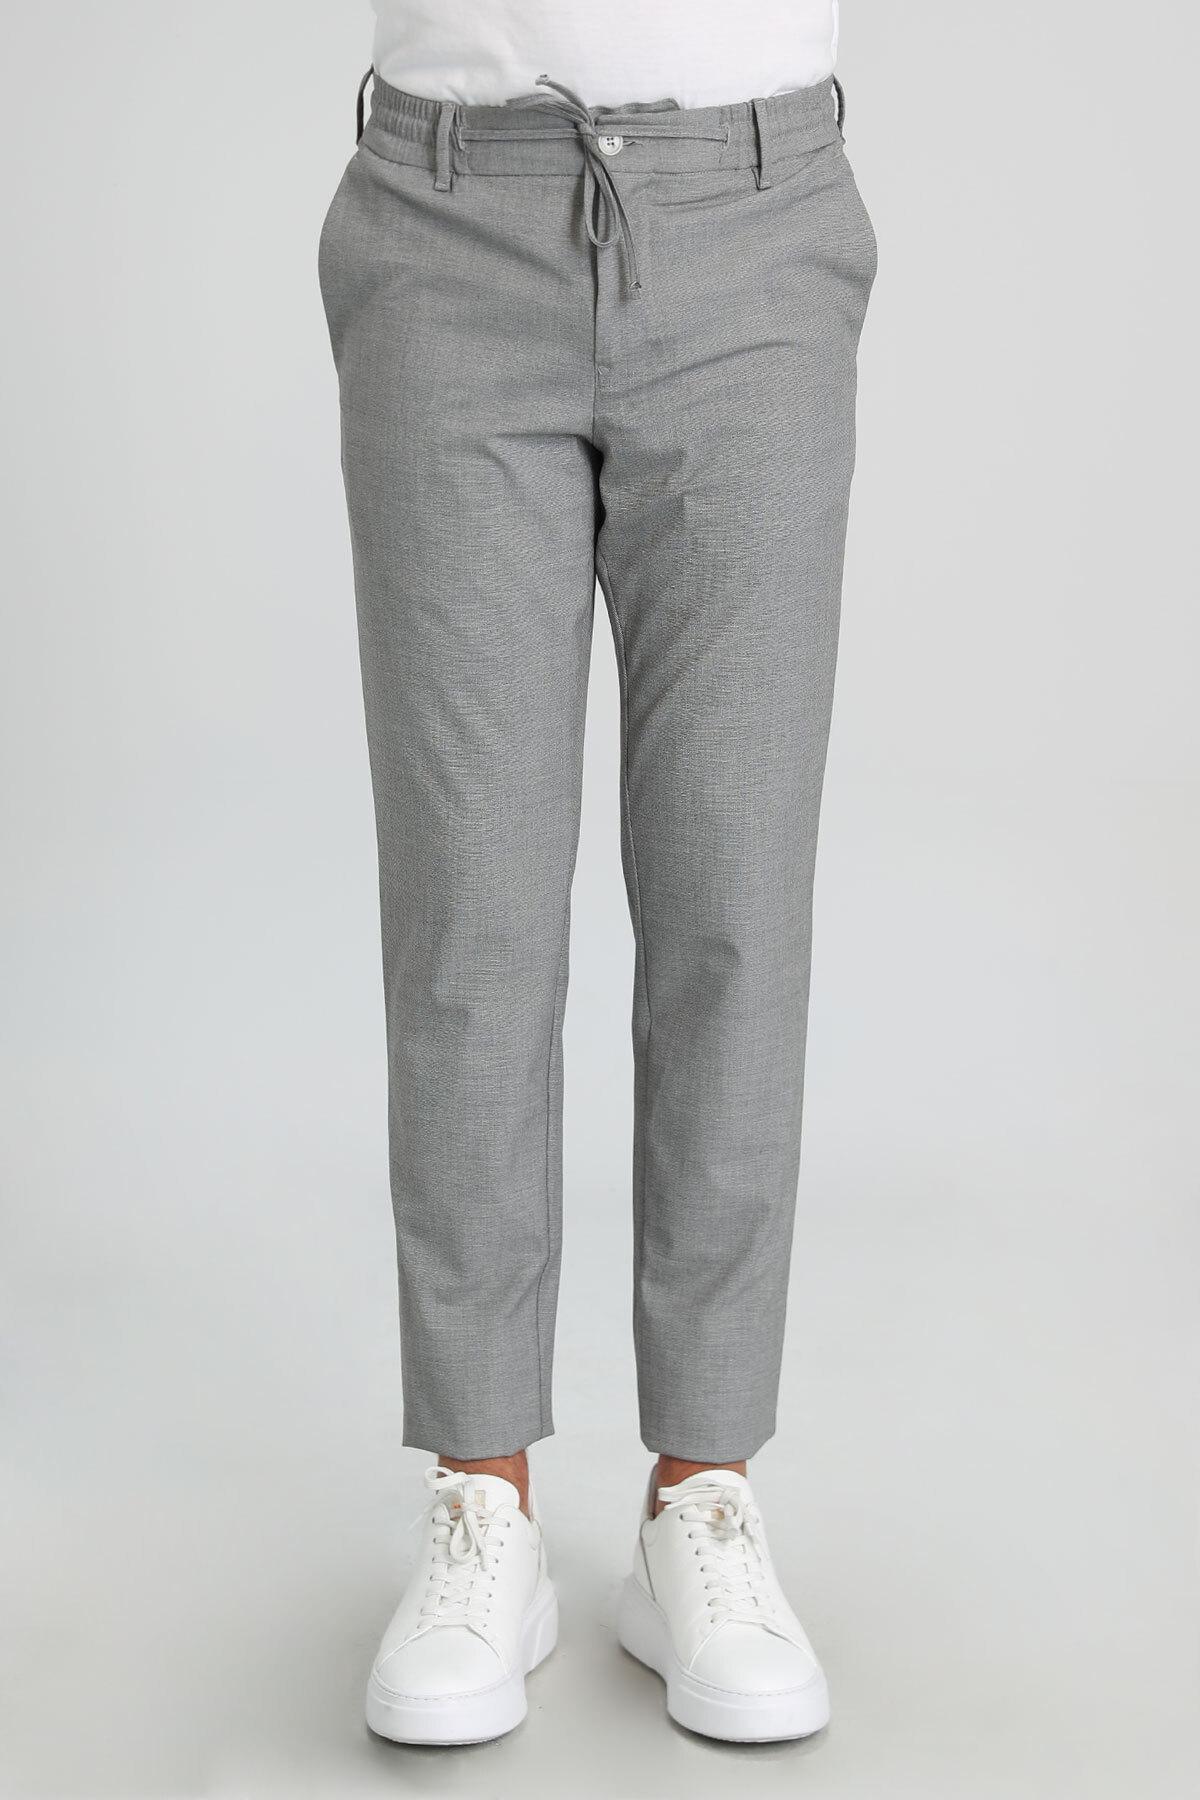 Gone Spor Erkek Chino Pantolon Tailored Fit Gri